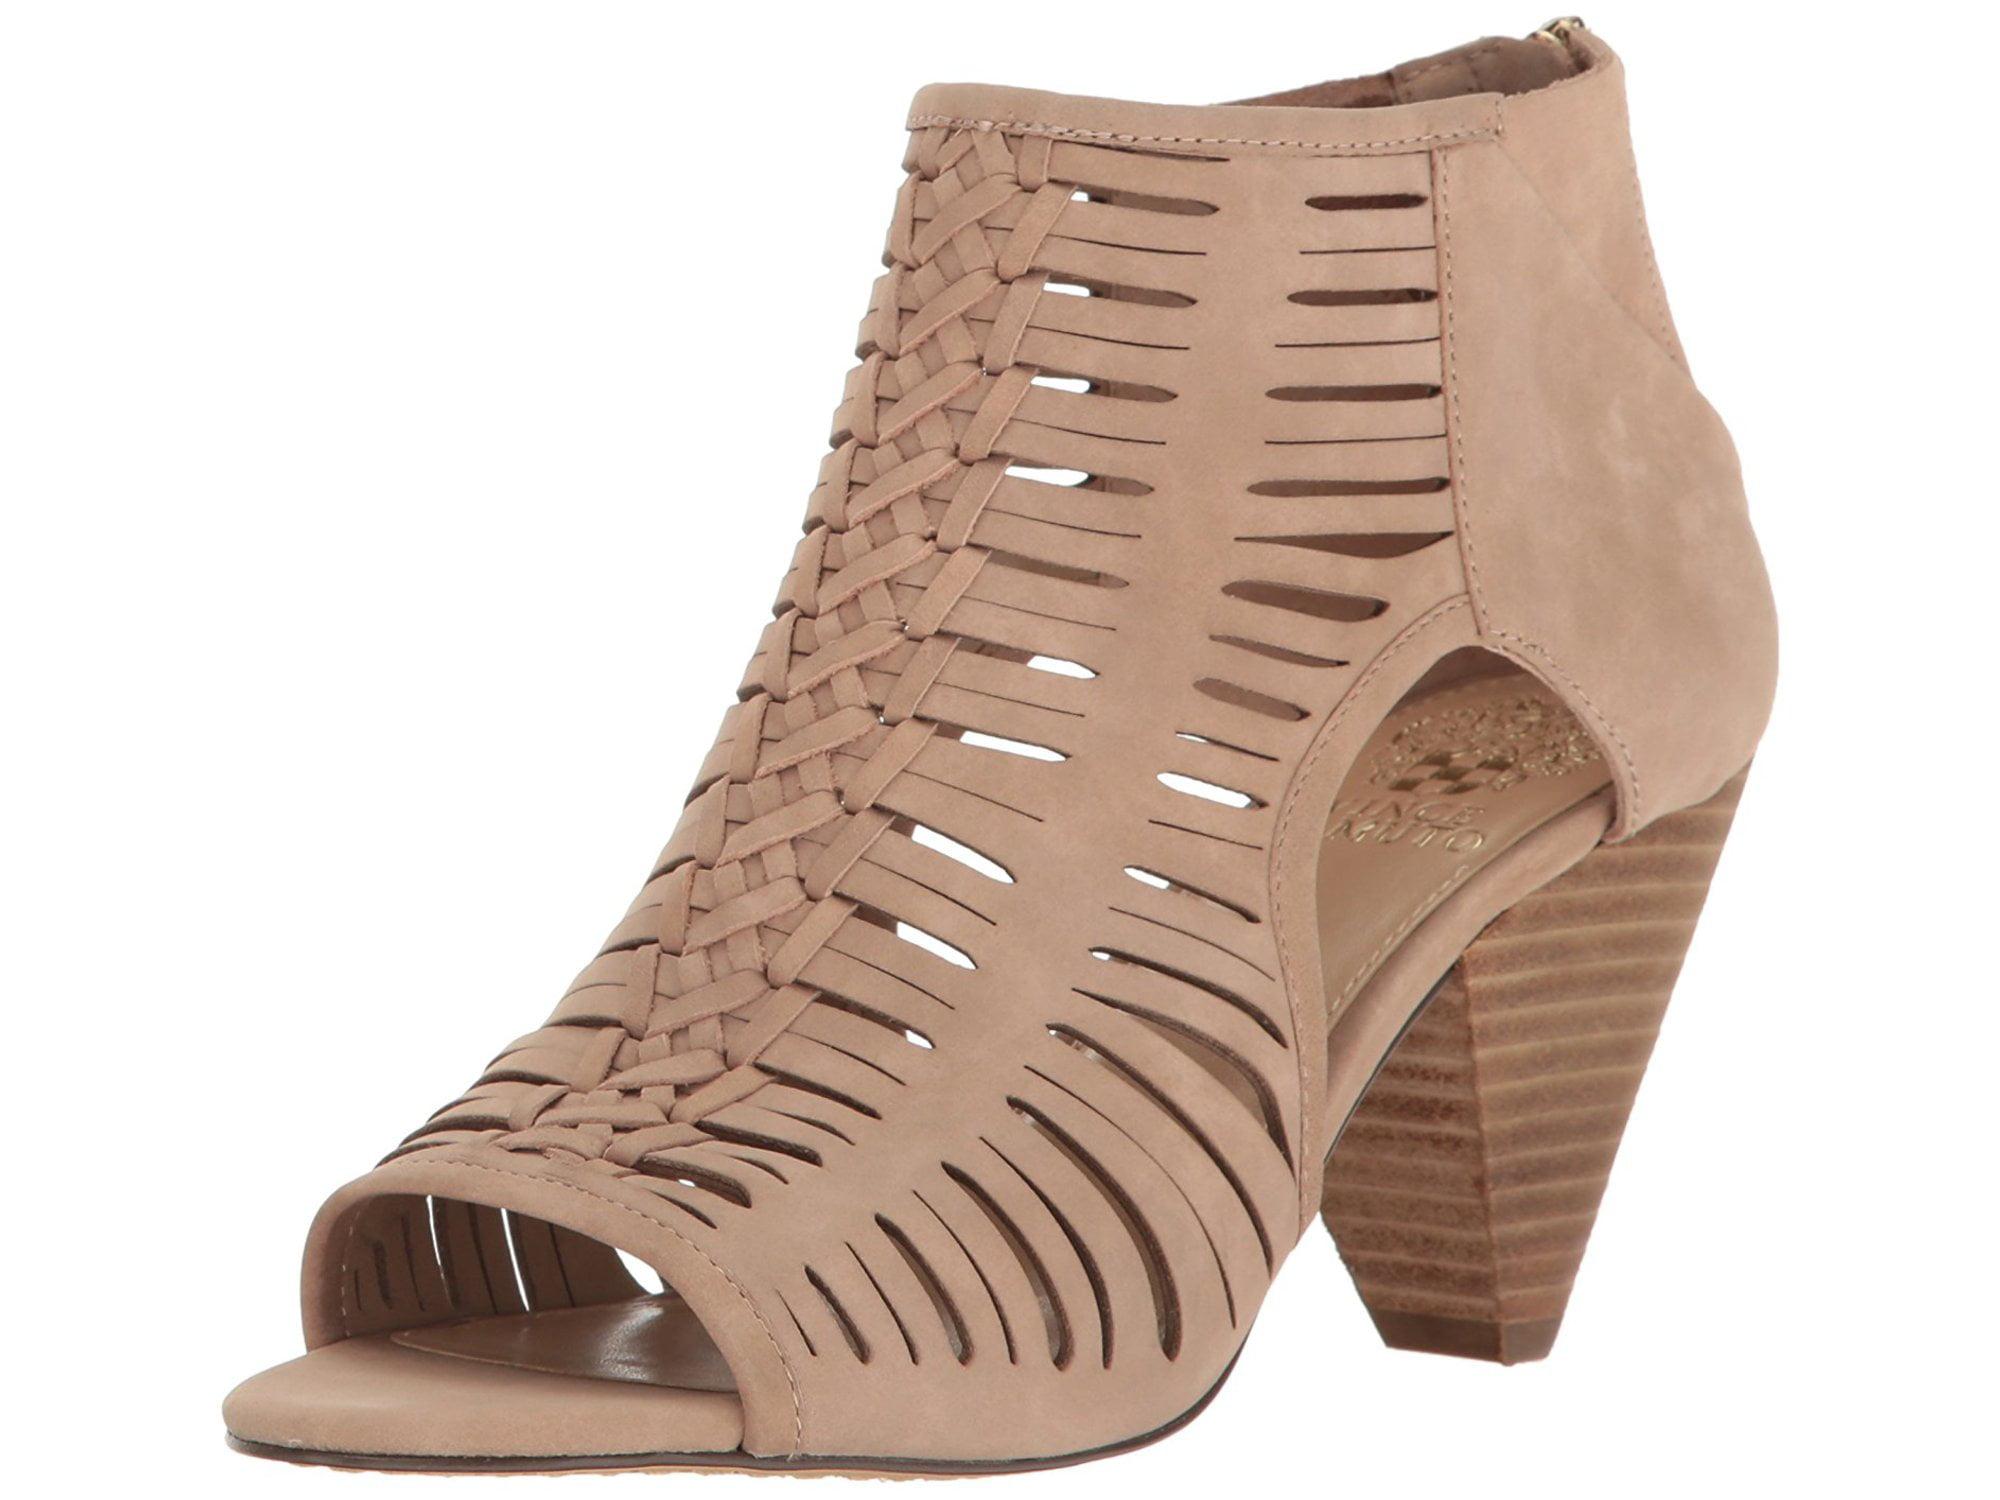 7d9b8332464e Vince Camuto Womens Eldora Open Toe Casual Ankle Strap